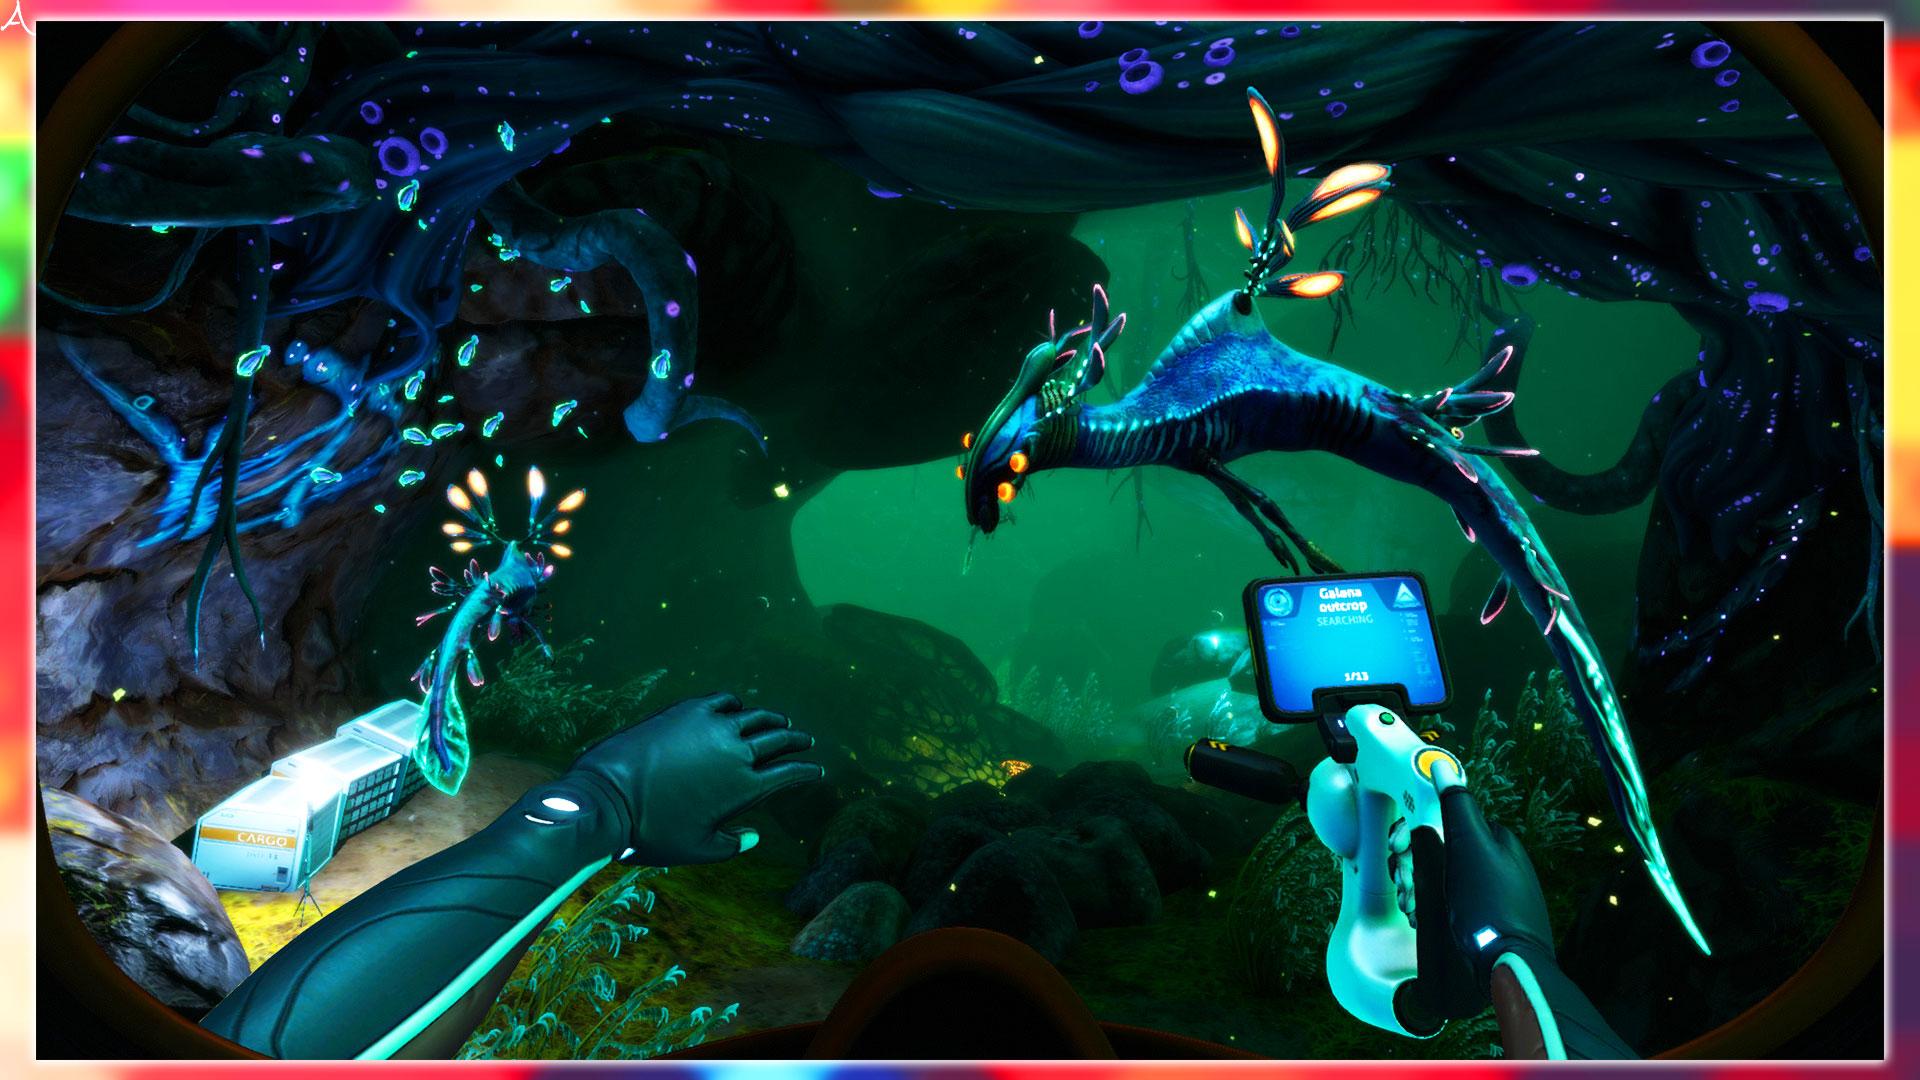 PC版「Subnautica: Below Zero」に必要な最低/推奨スペックを確認